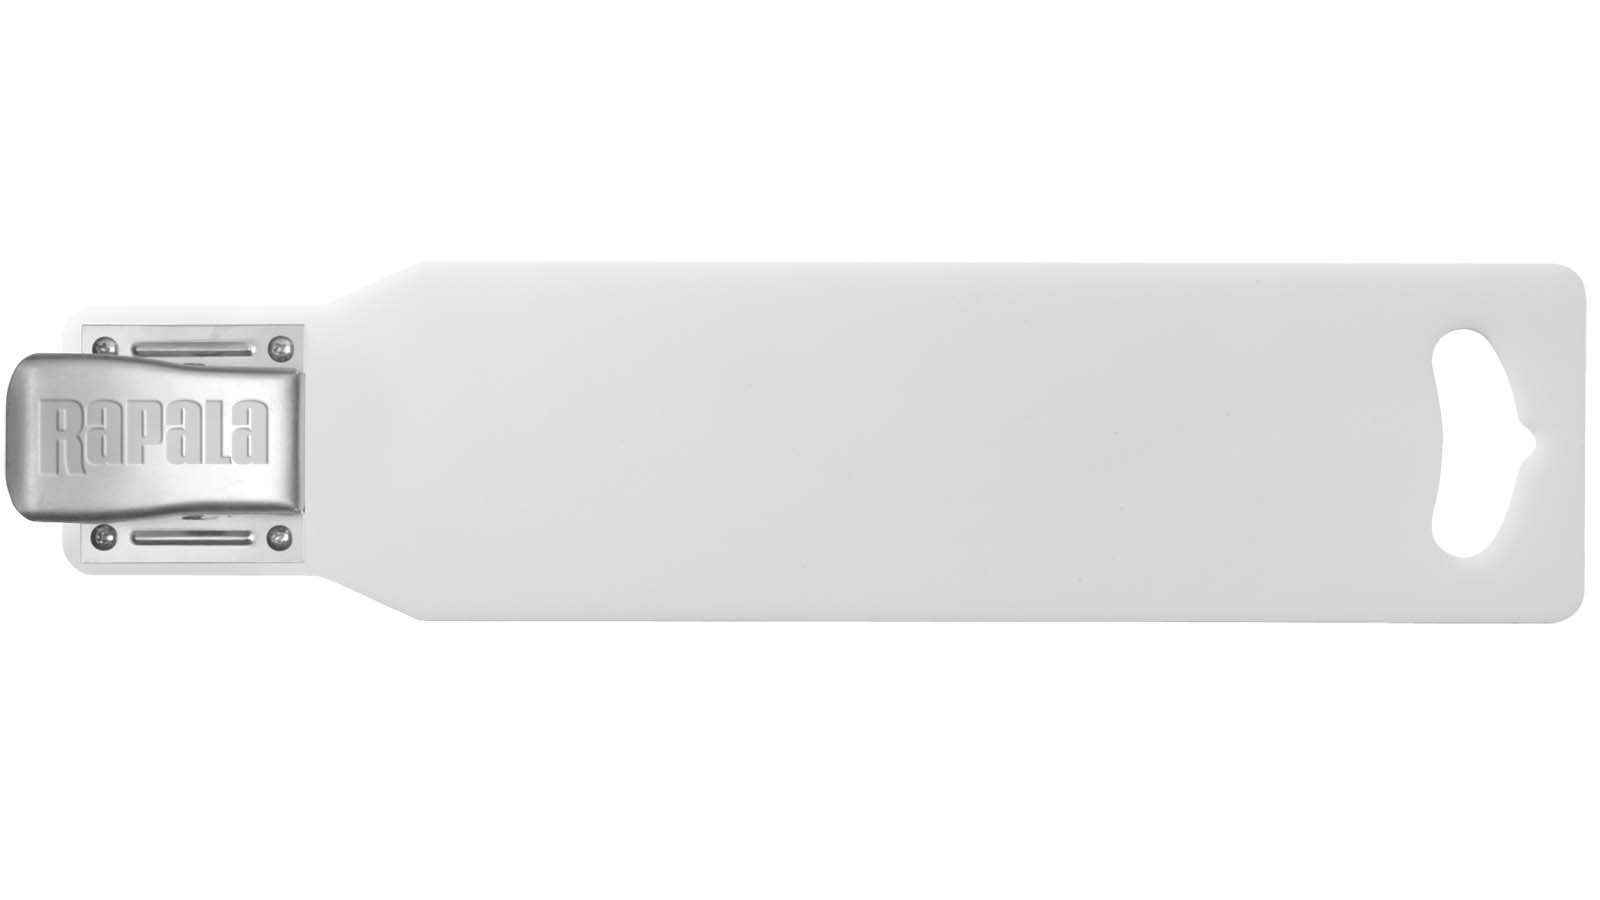 Rapala PFBC Pro Fillet Board w/Clamp, Sure-Grip Clamp, 5-1/2